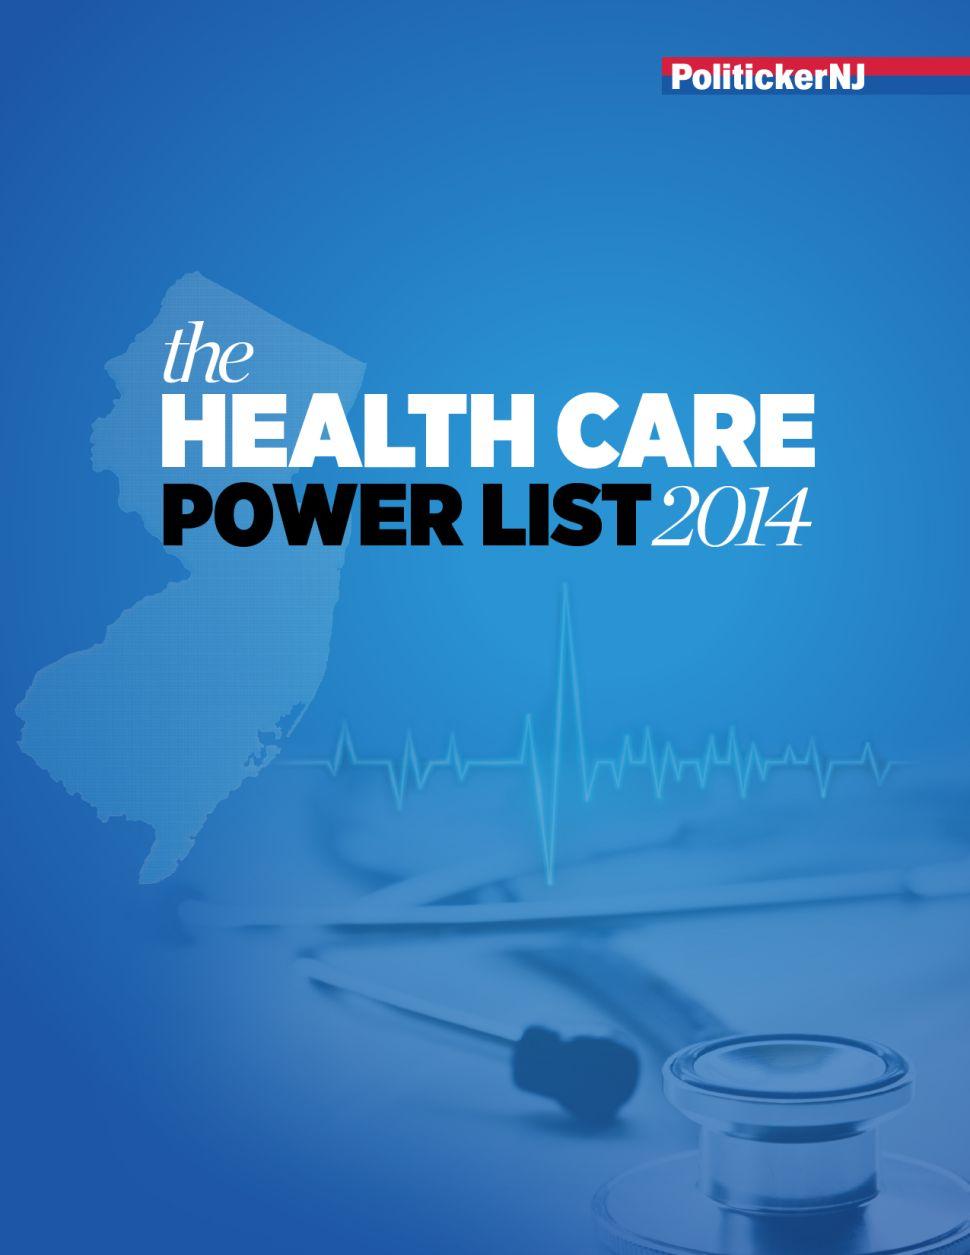 PolitickerNJ's Special Healthcare Power List